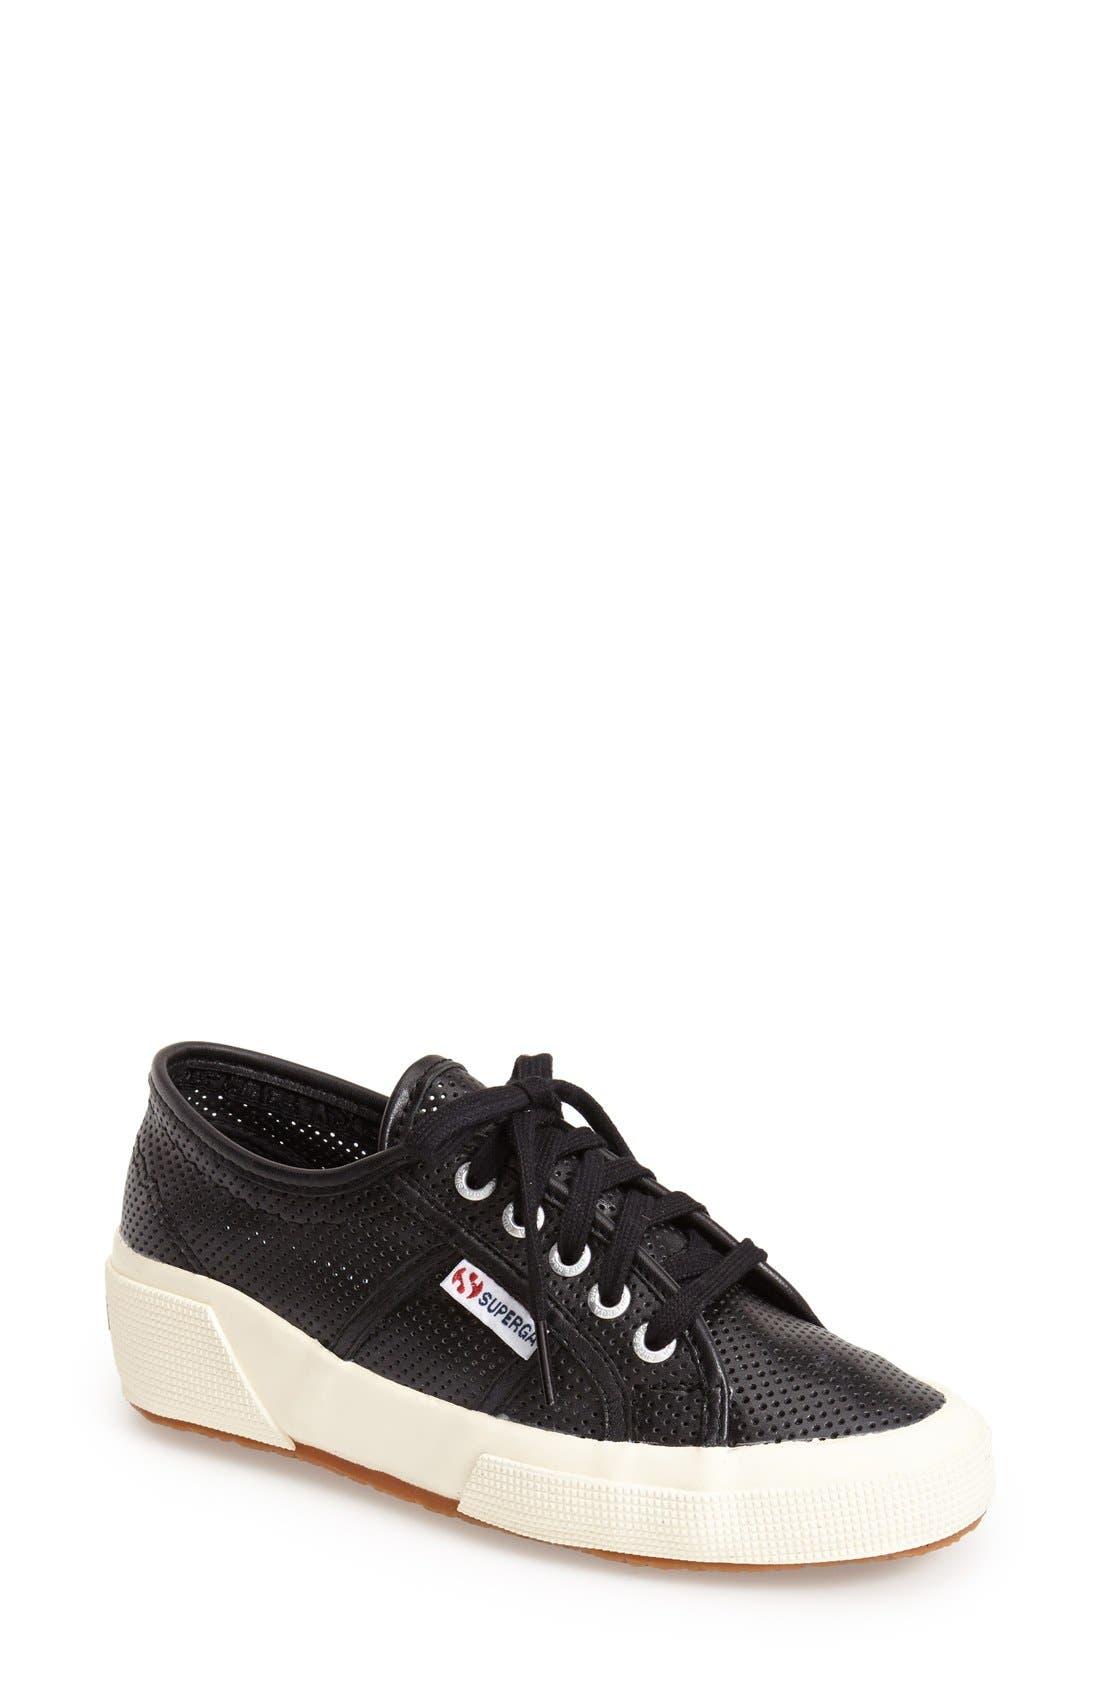 Alternate Image 1 Selected - Superga 'Perforated Cotu' Leather Sneaker (Women)